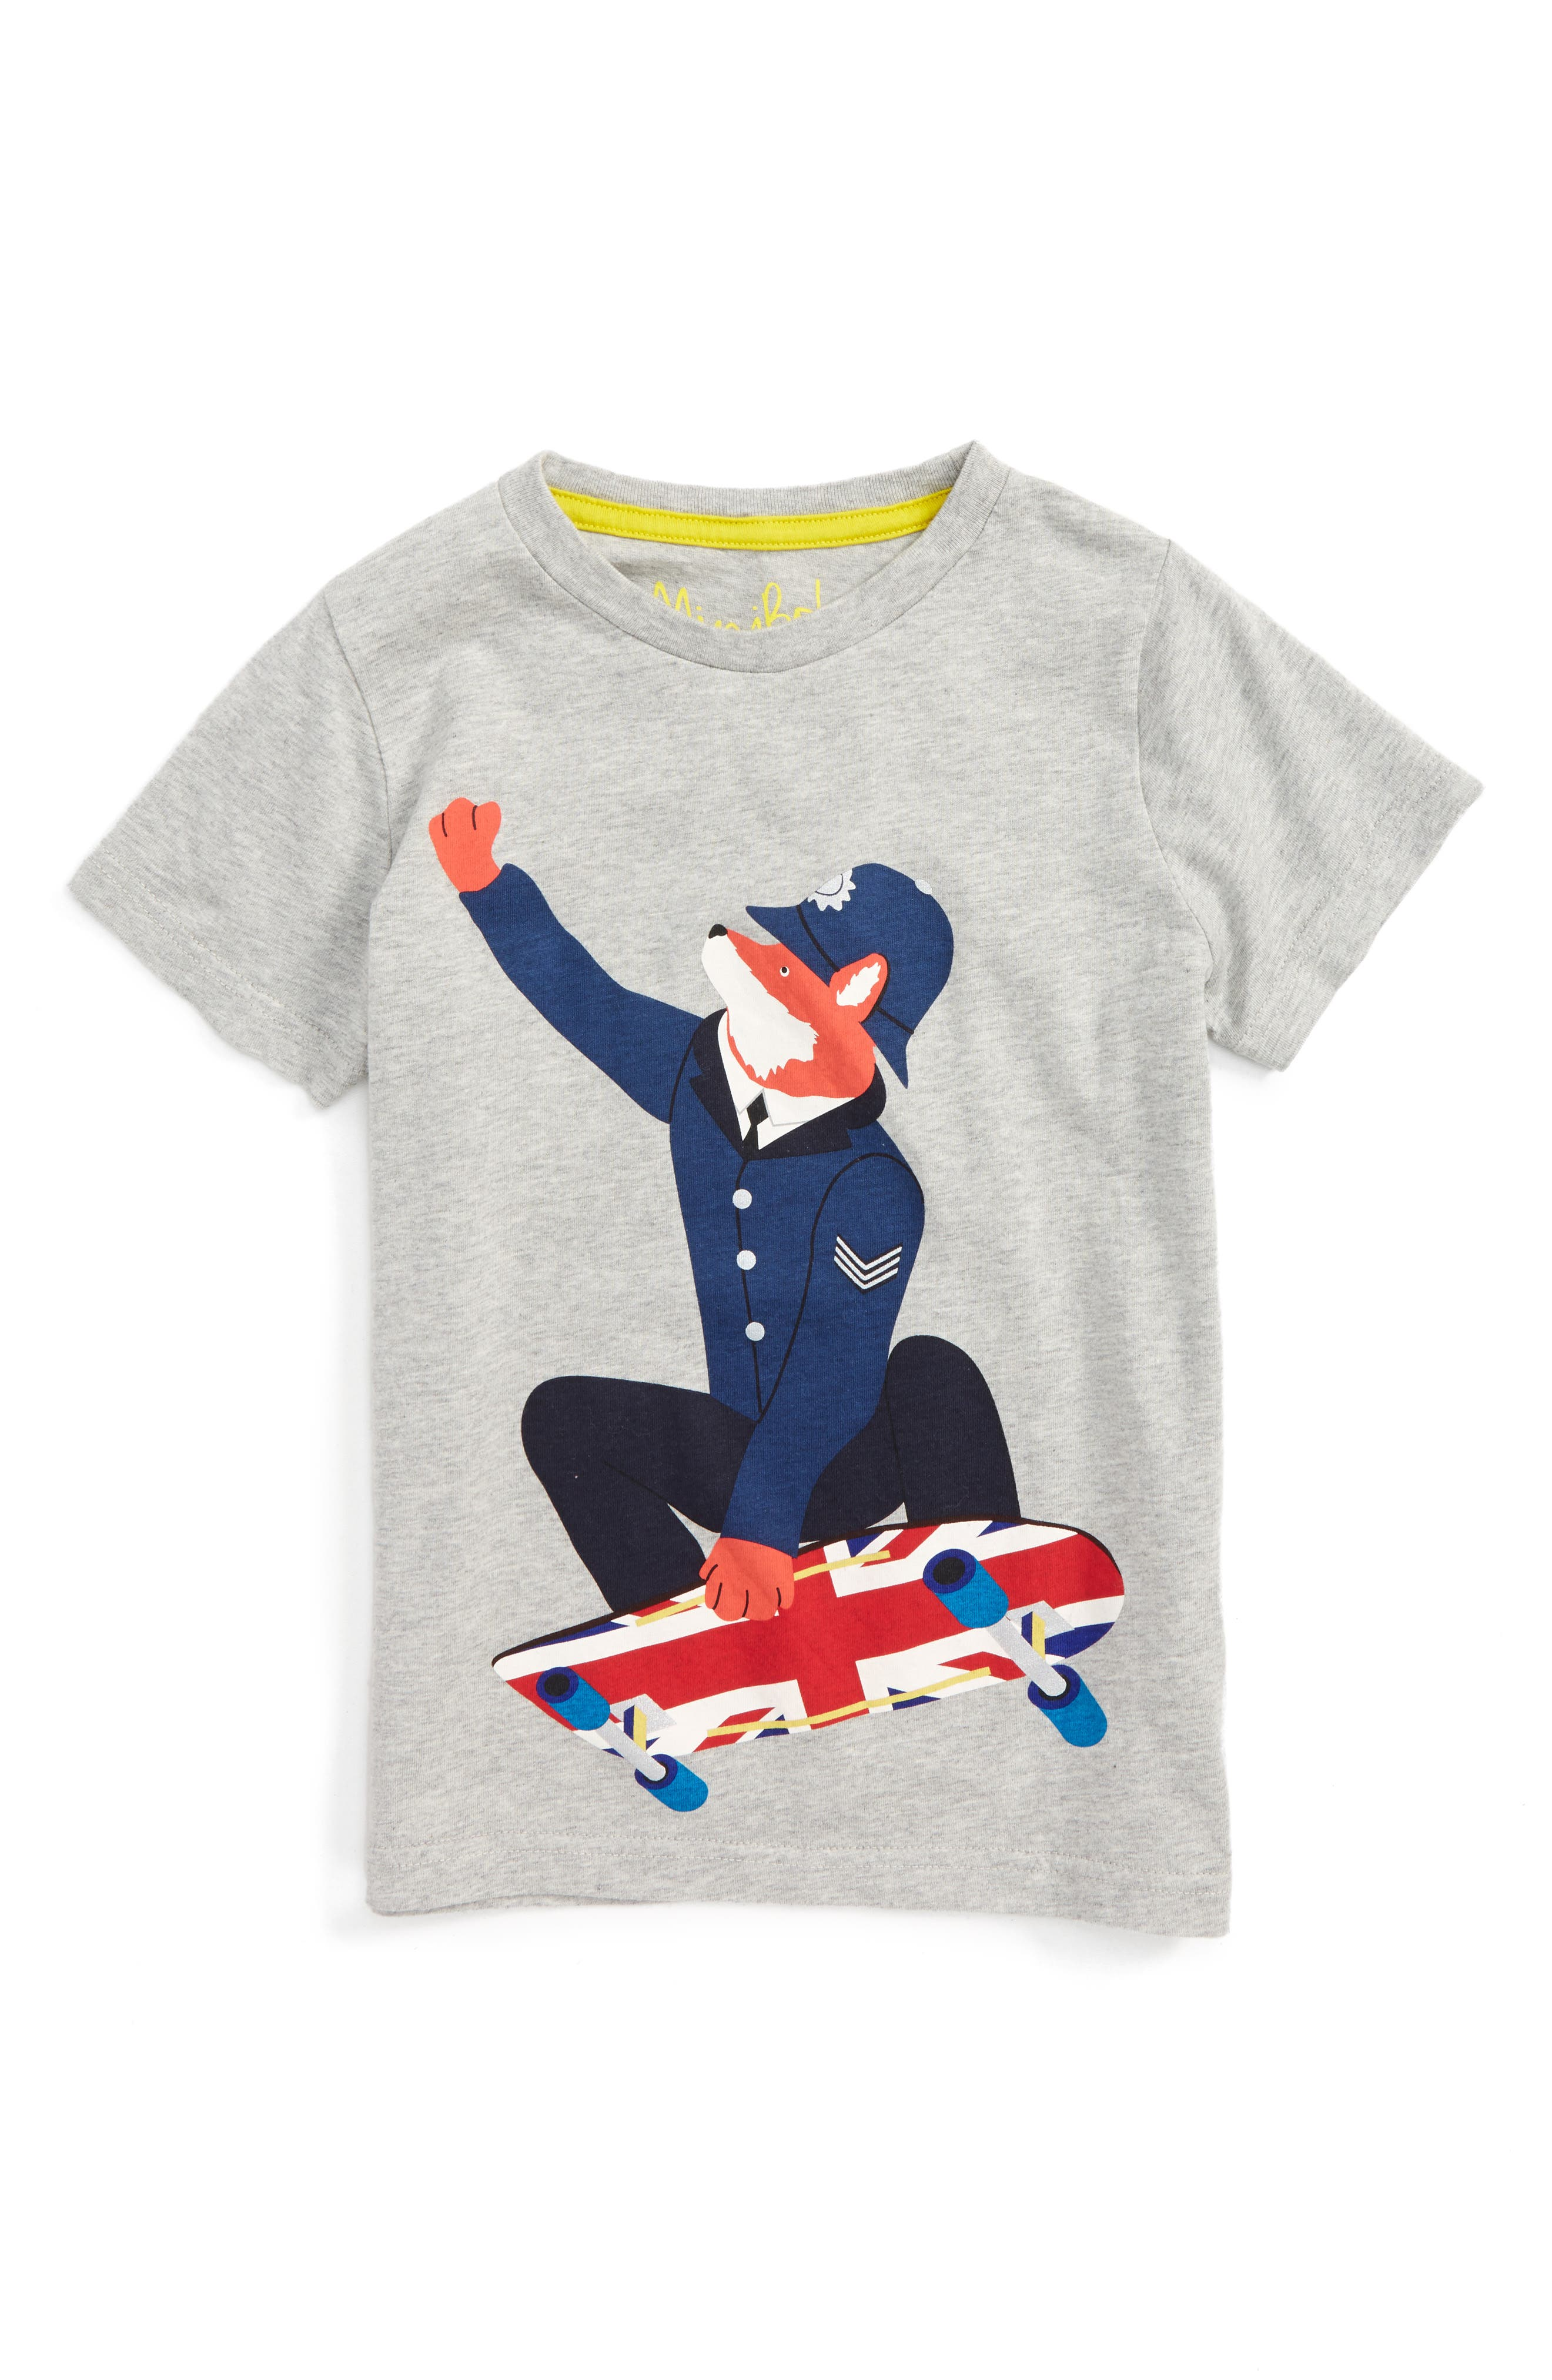 Main Image - Mini Boden Great British Bobby Fox Graphic T-Shirt (Toddler Boys, Little Boys & Big Boys)